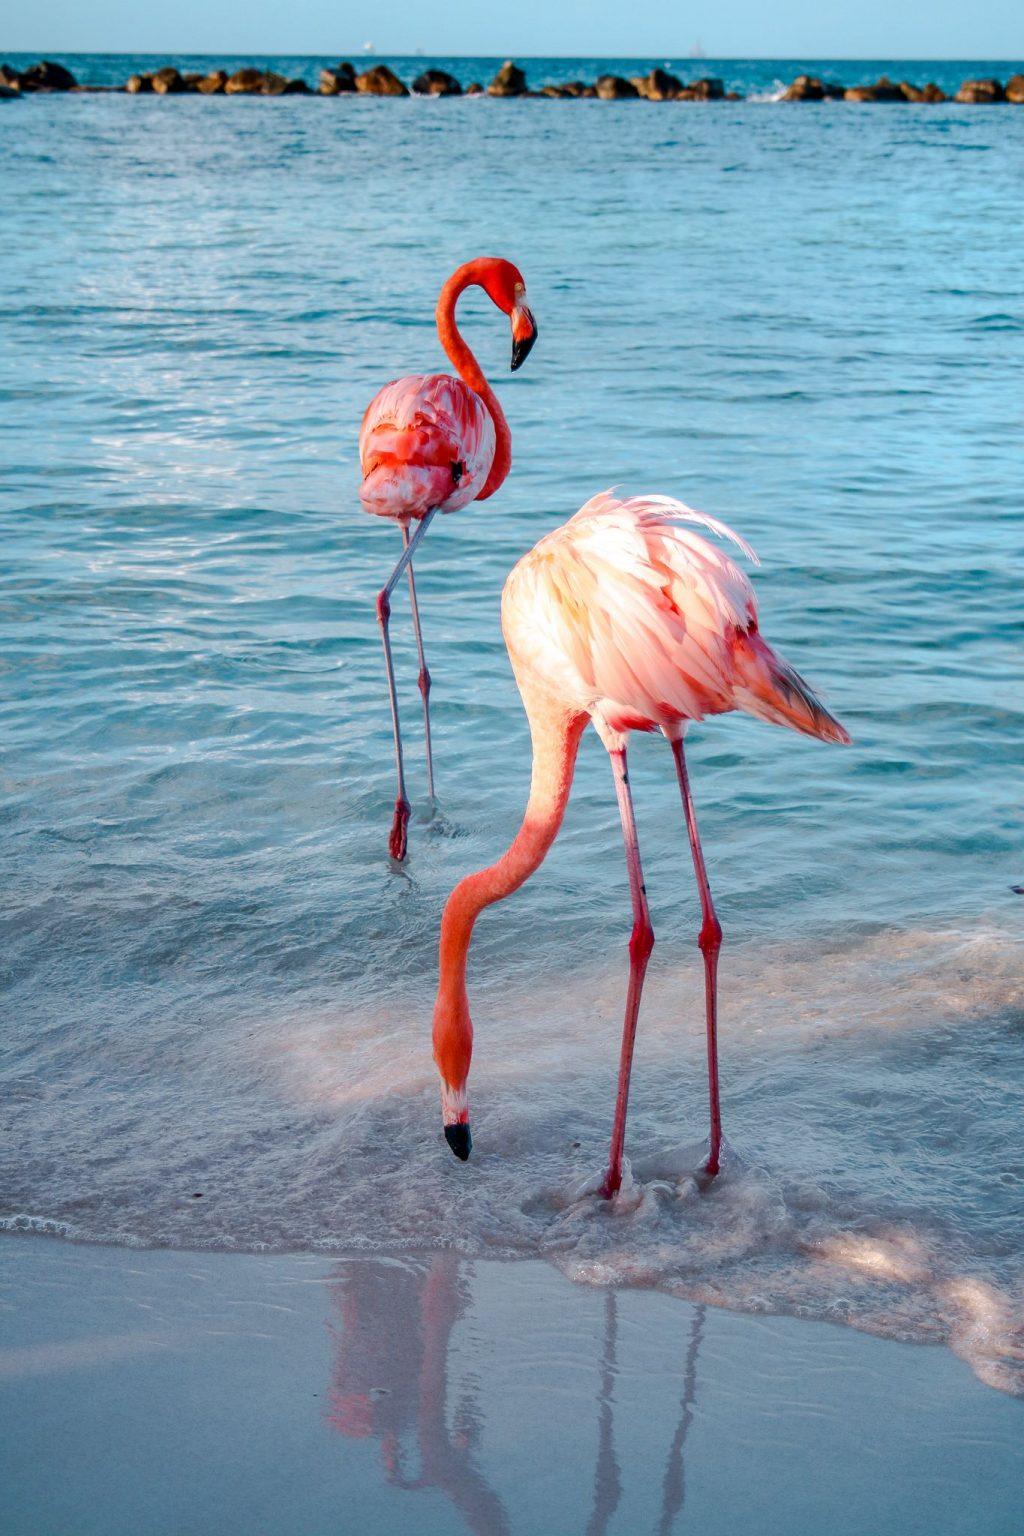 Flamingos at Flamingo Beach in Aruba